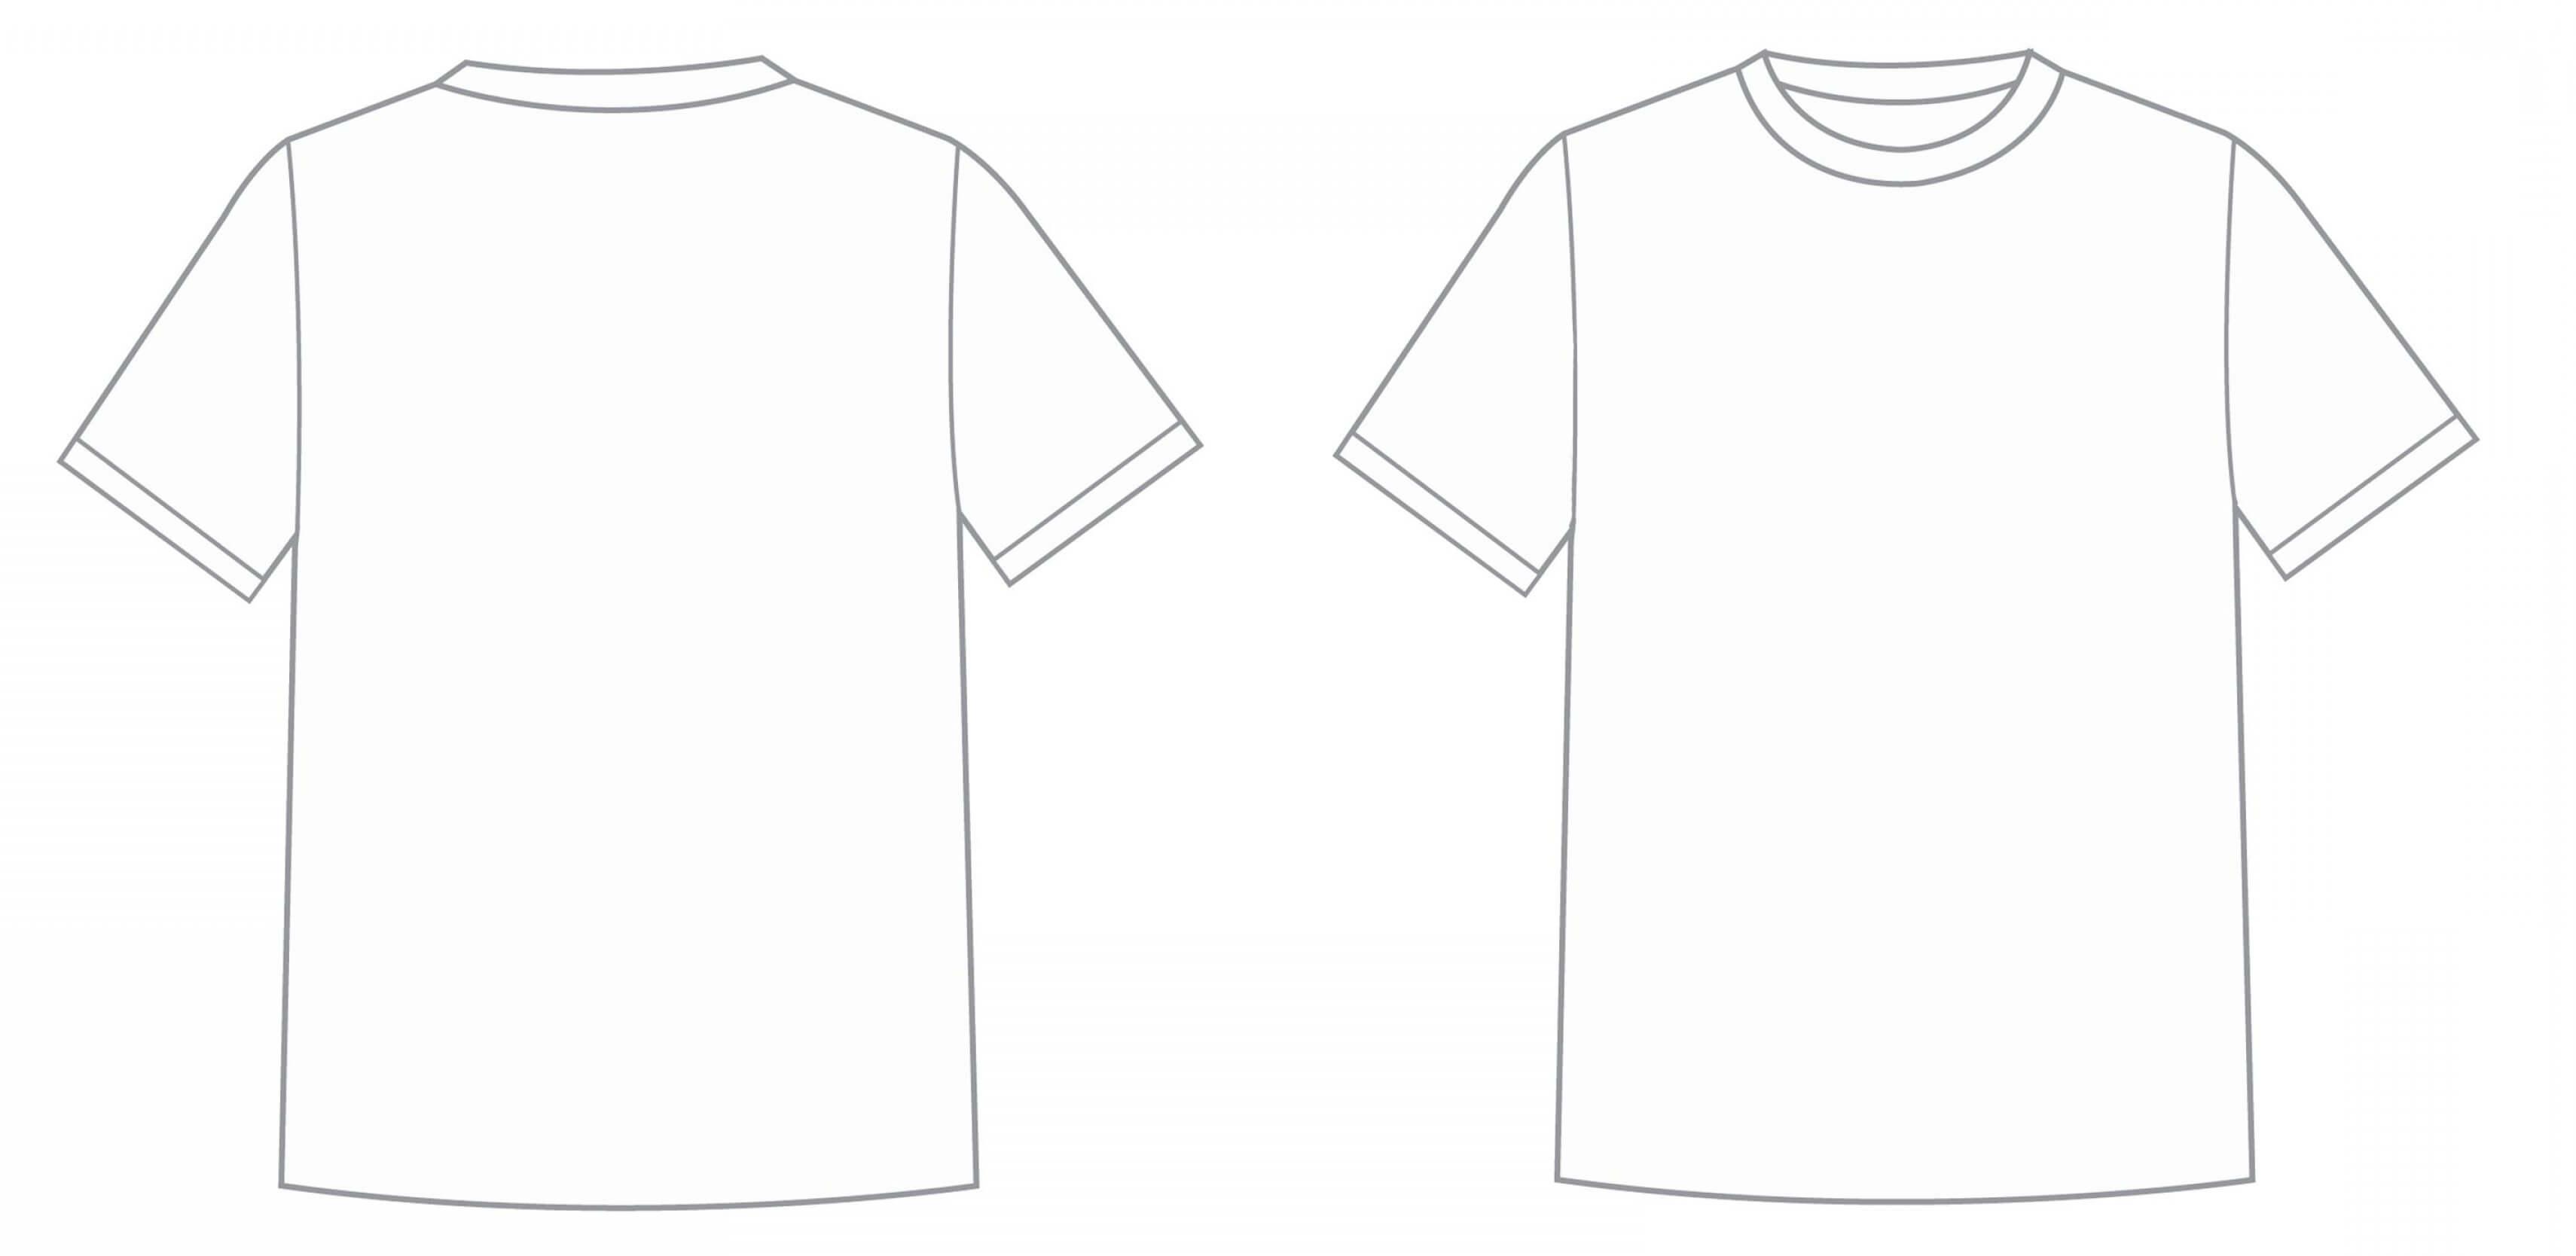 Blank Tee Shirt Template Luxury Blank T Shirt Outline For Blank Tee Shirt Template